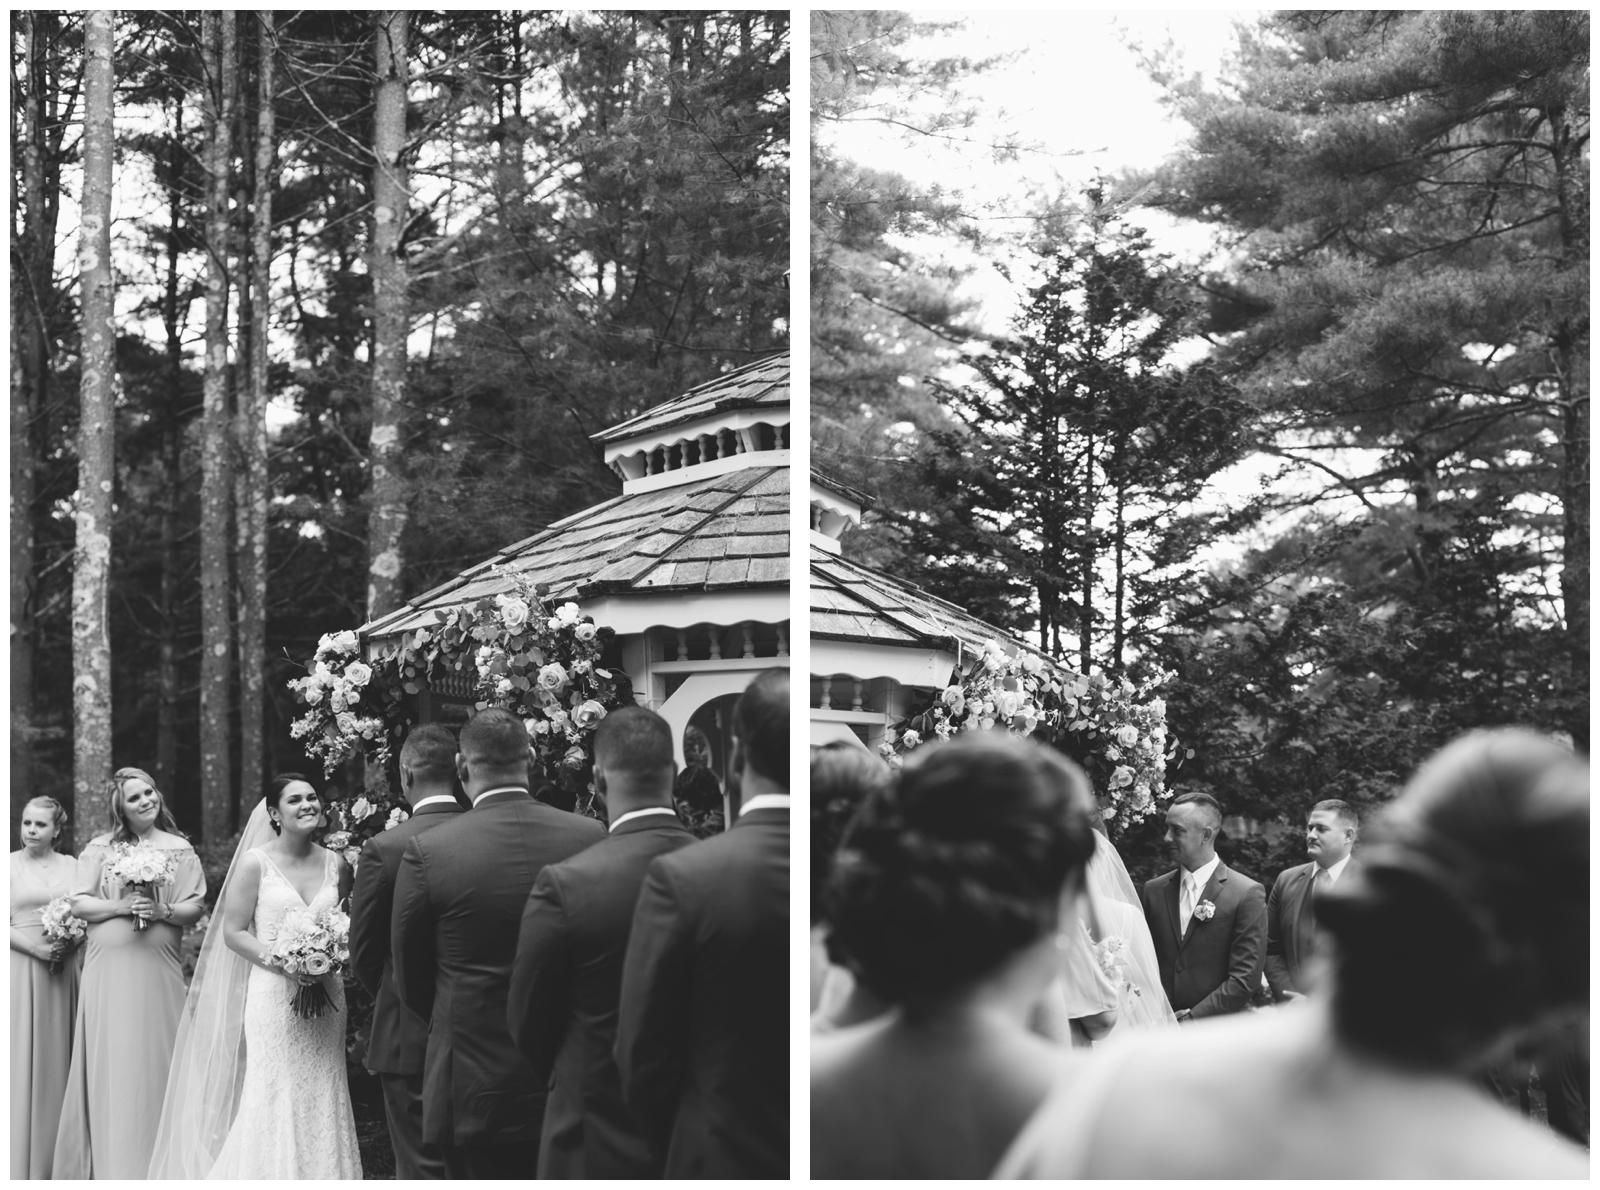 Bailey-Q-Photo-Pine-Hills-Pavilion-Wedding-Boston-Wedding-Photographer-060.jpg